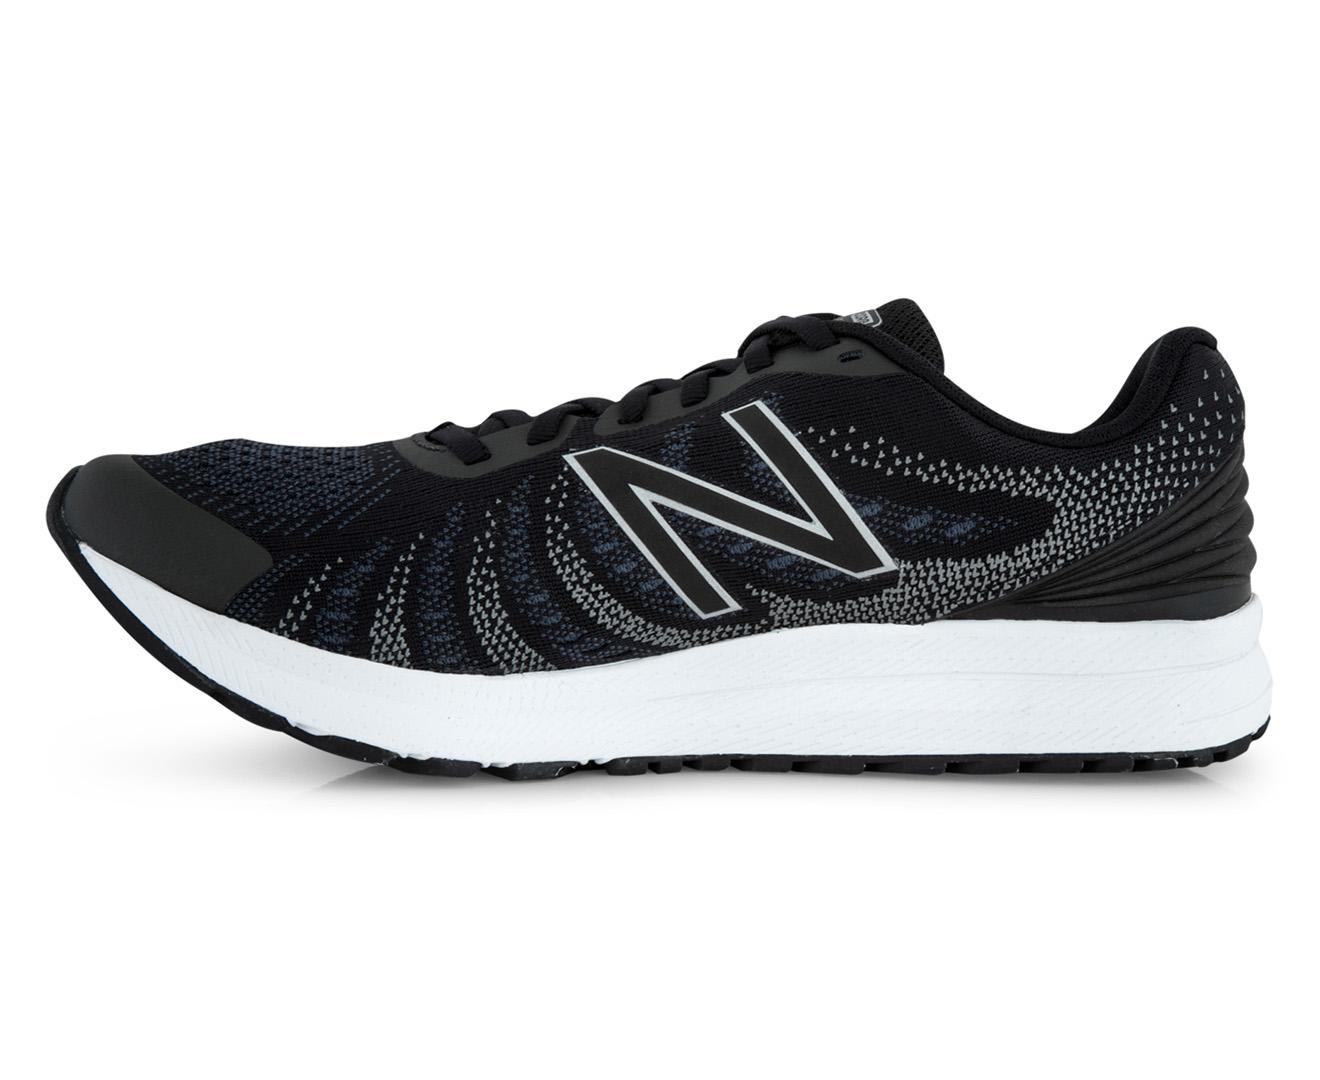 New Balance E Width Shoes Australia